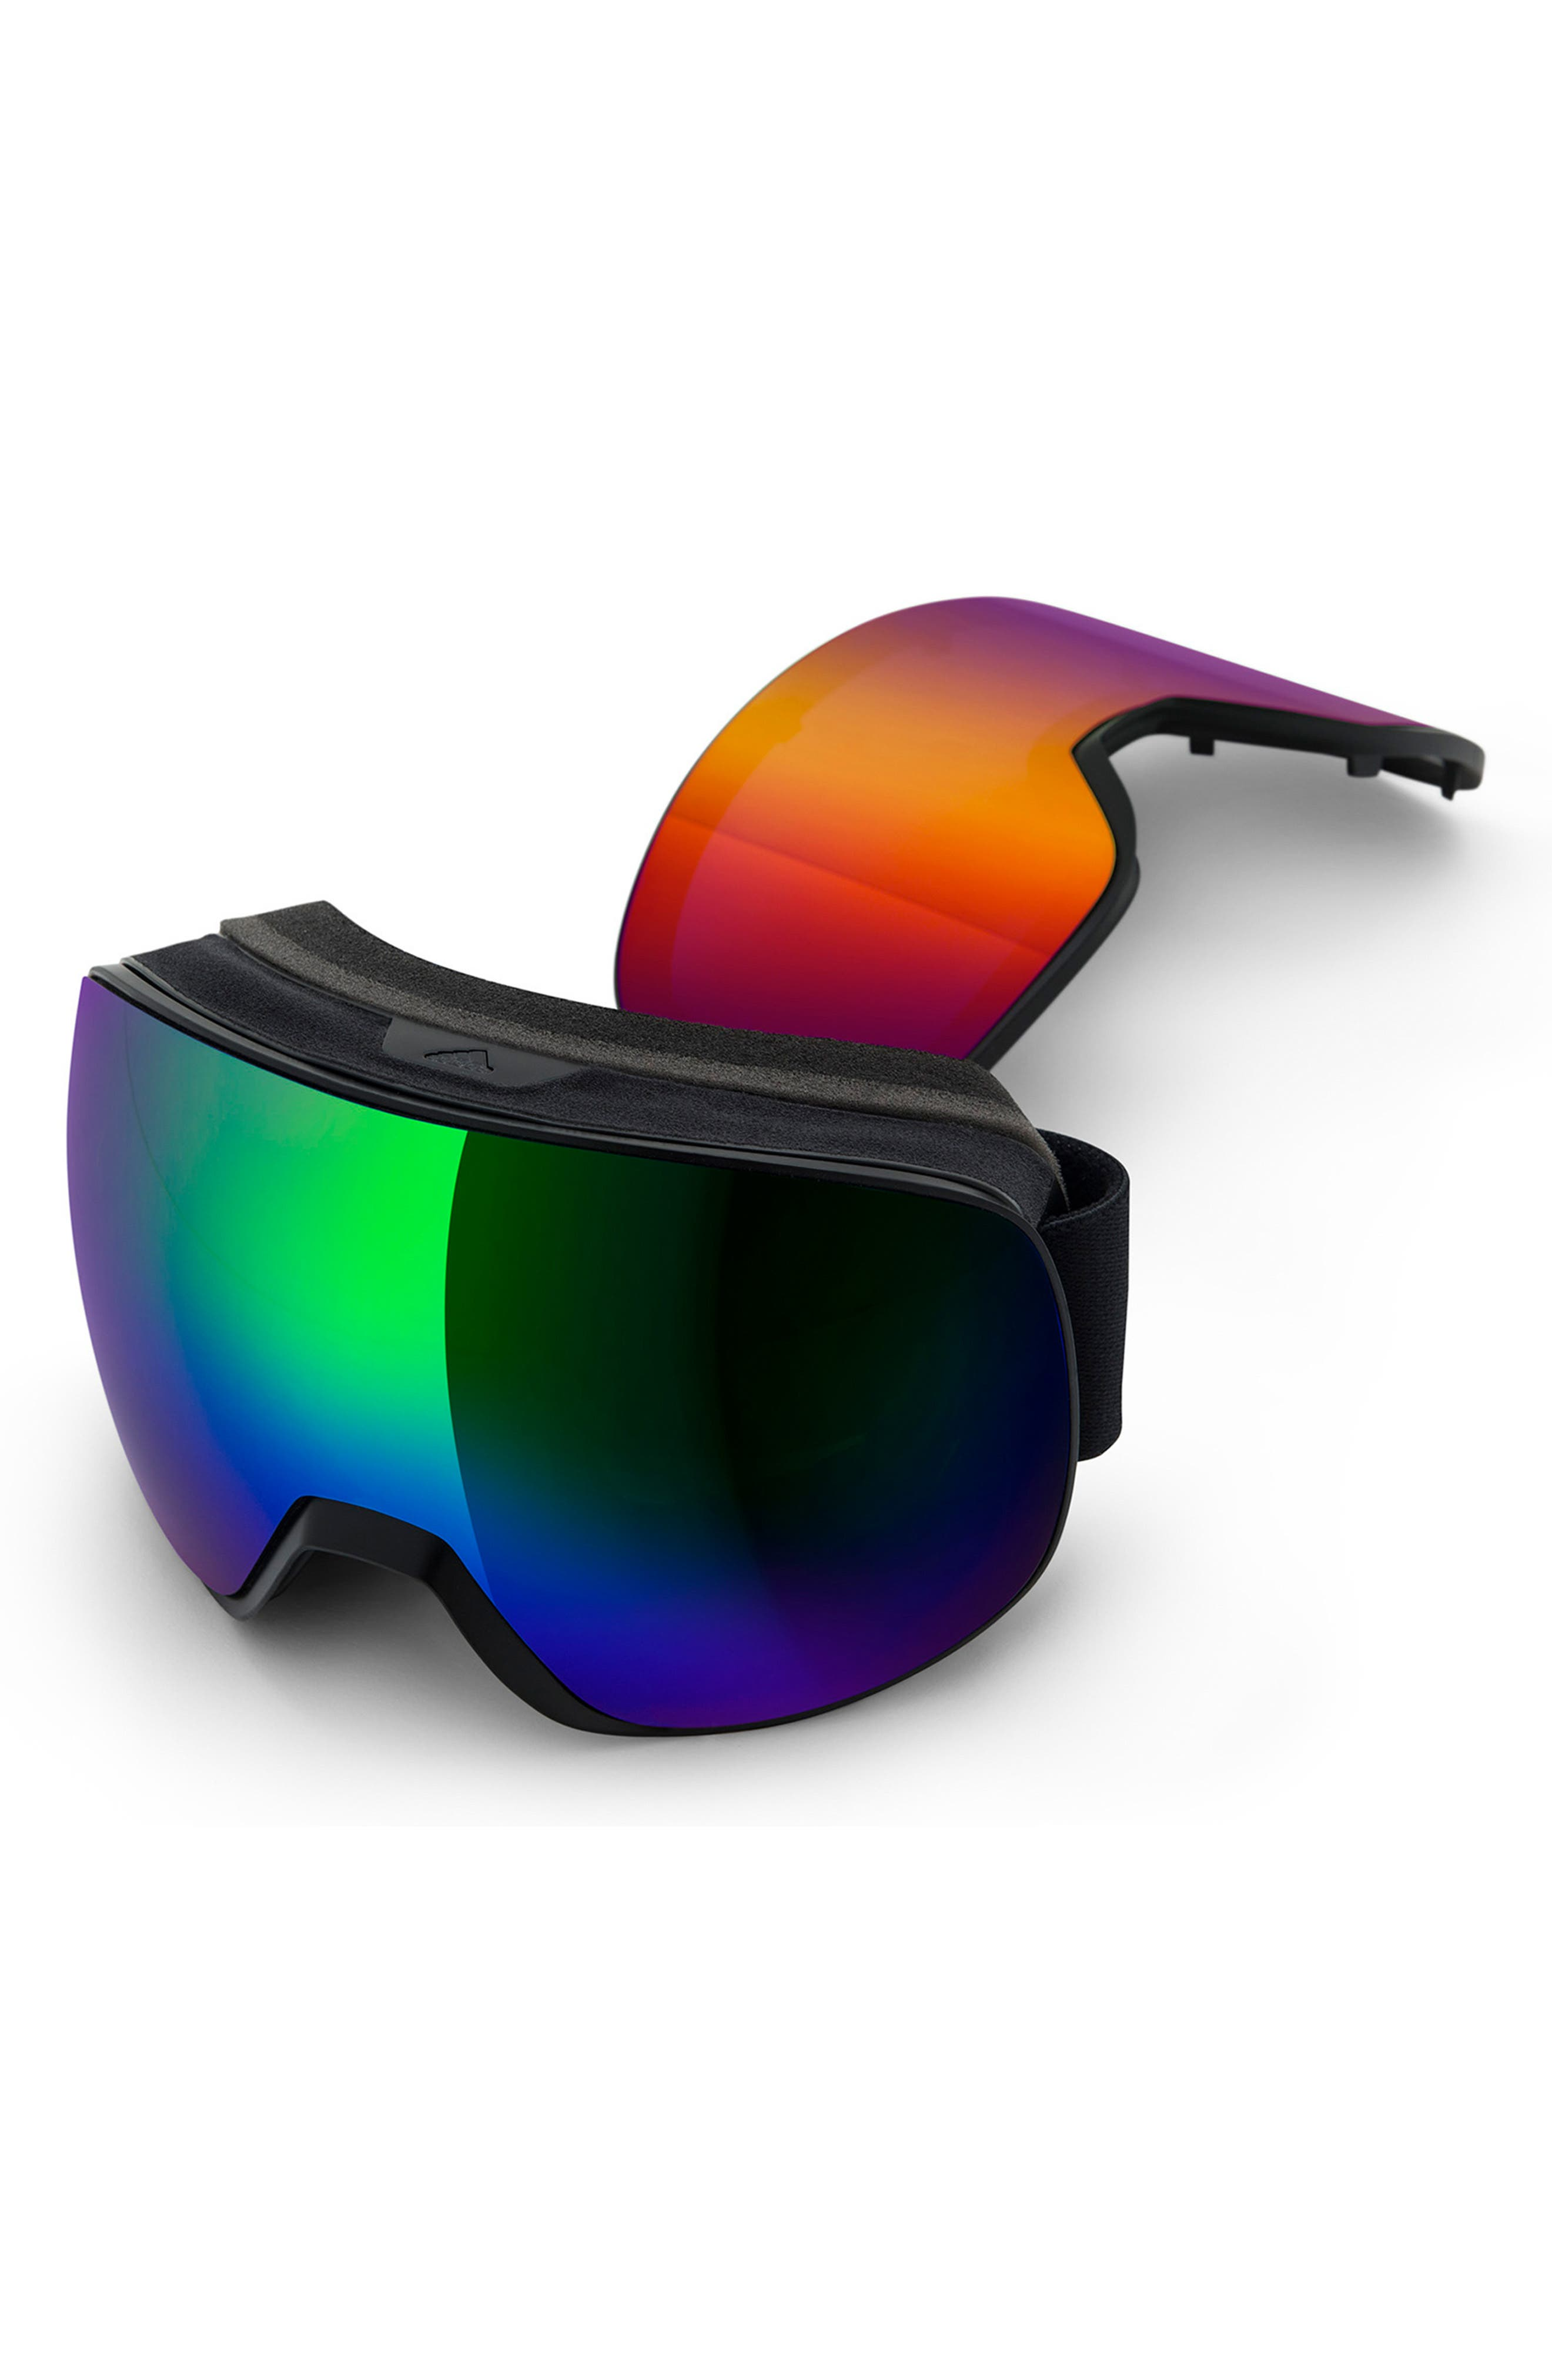 Progressor L Mirrored Spherical Snowsports GogglesED, Main, color, BLACK MATTE/ GREEN